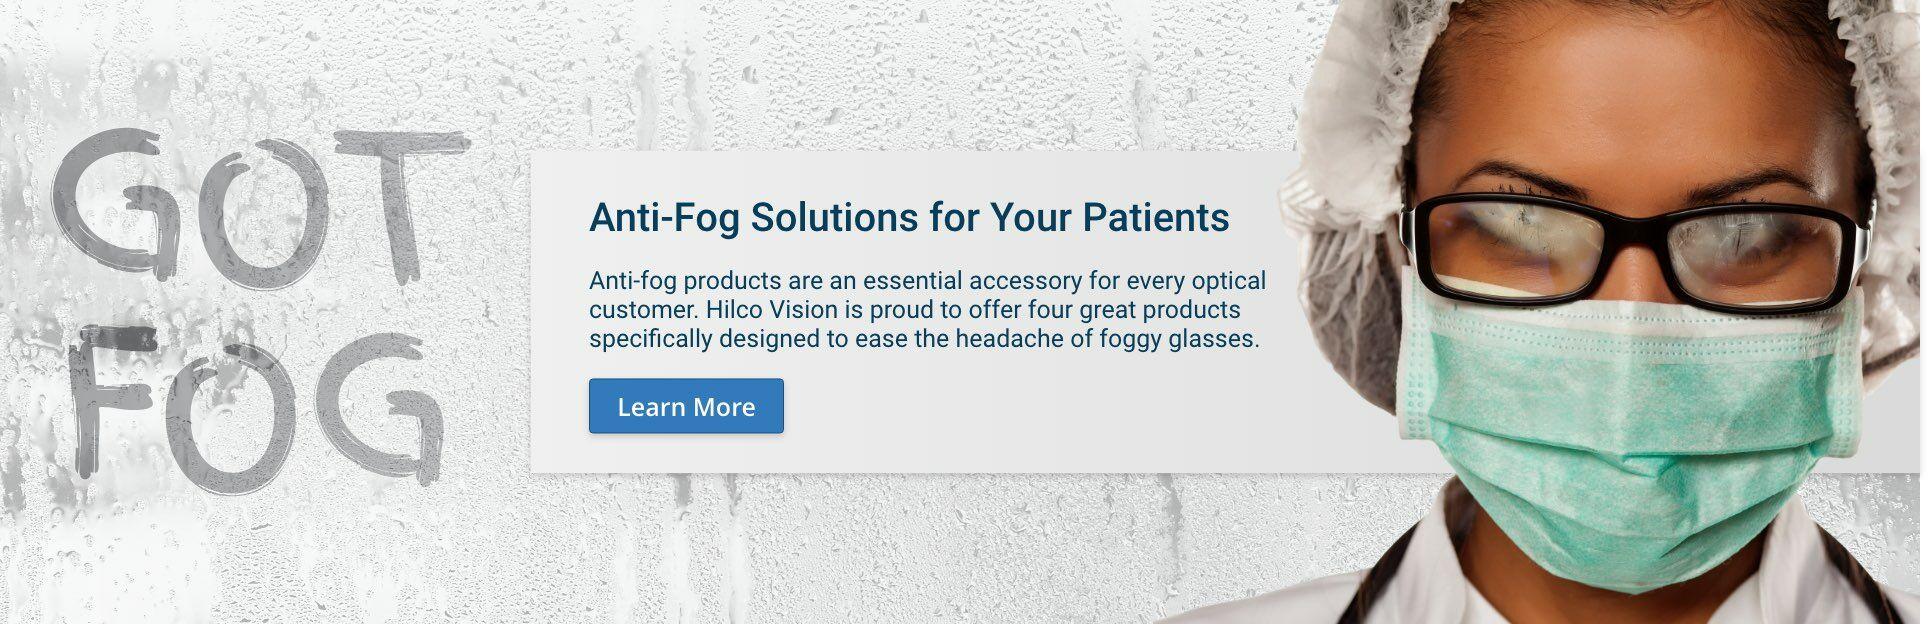 hilco-vision-anti-fog-au